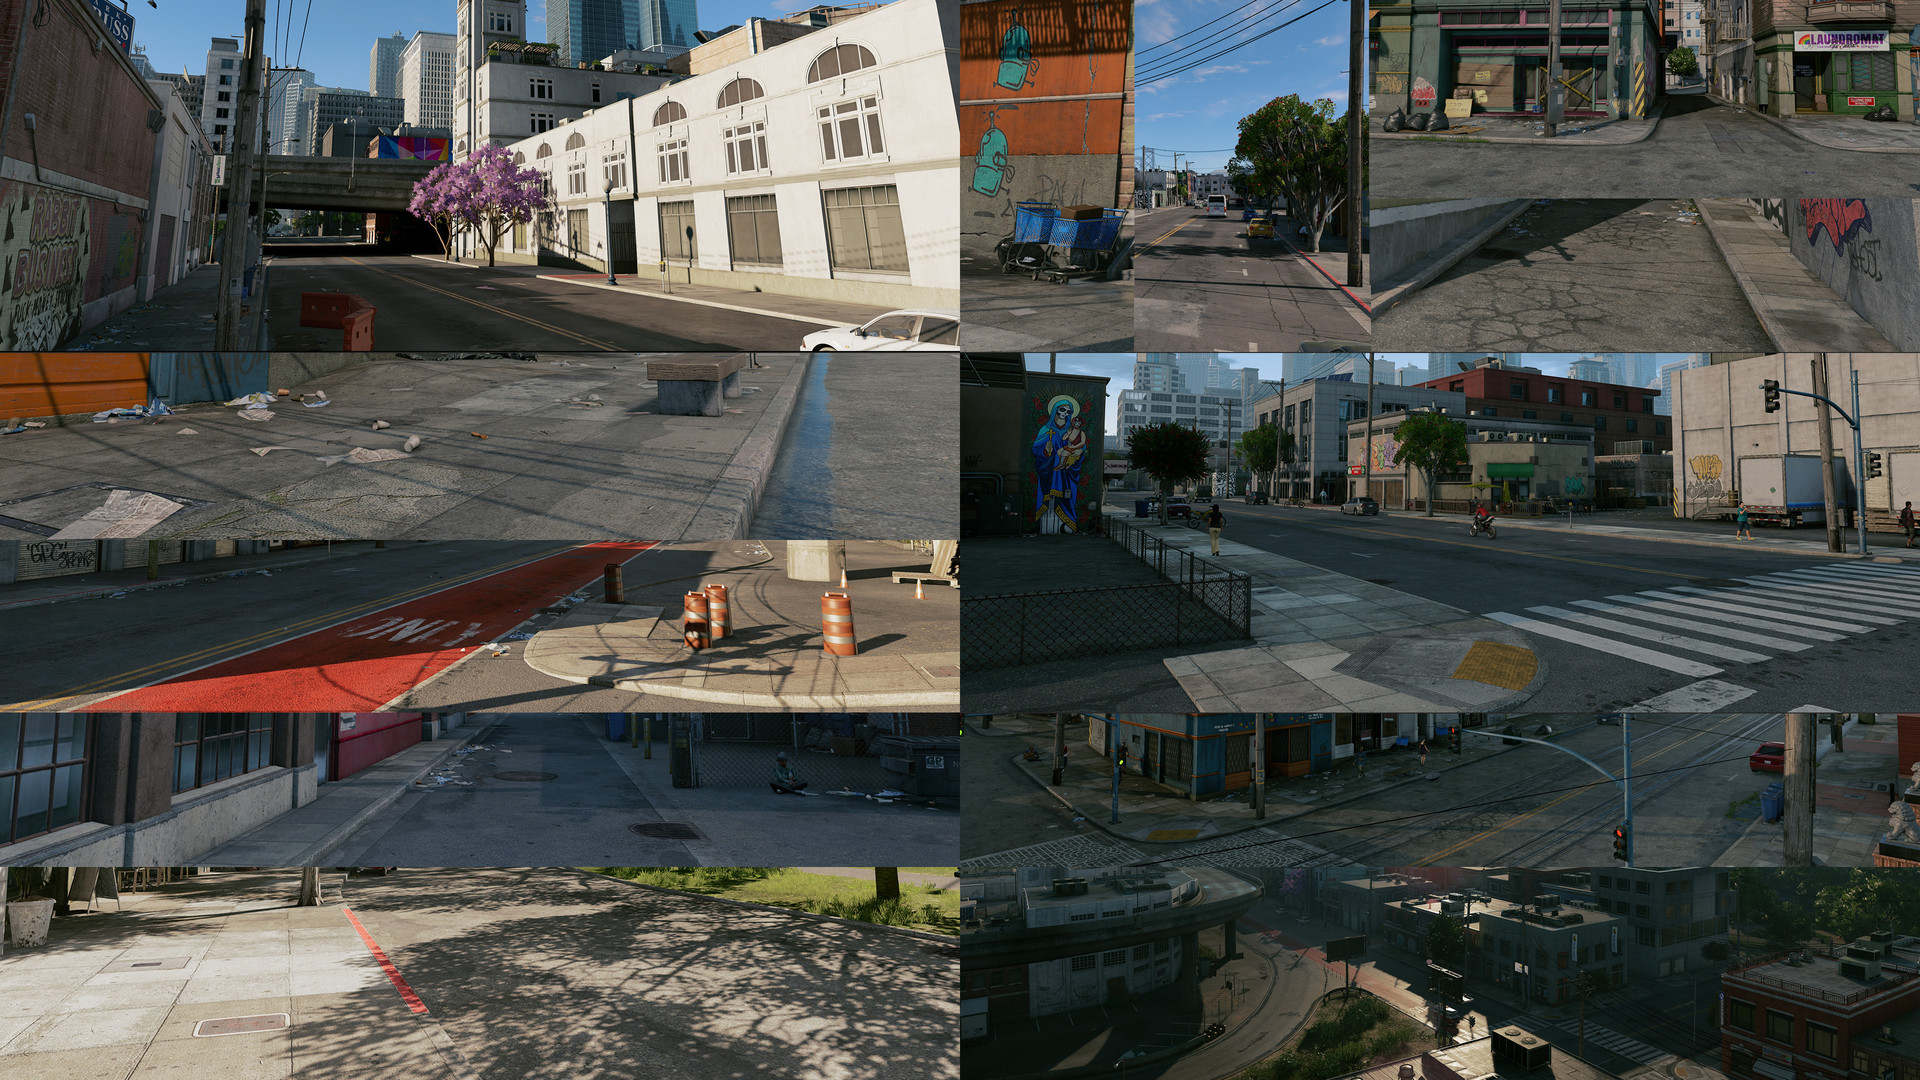 Corey hill street prop lookdev